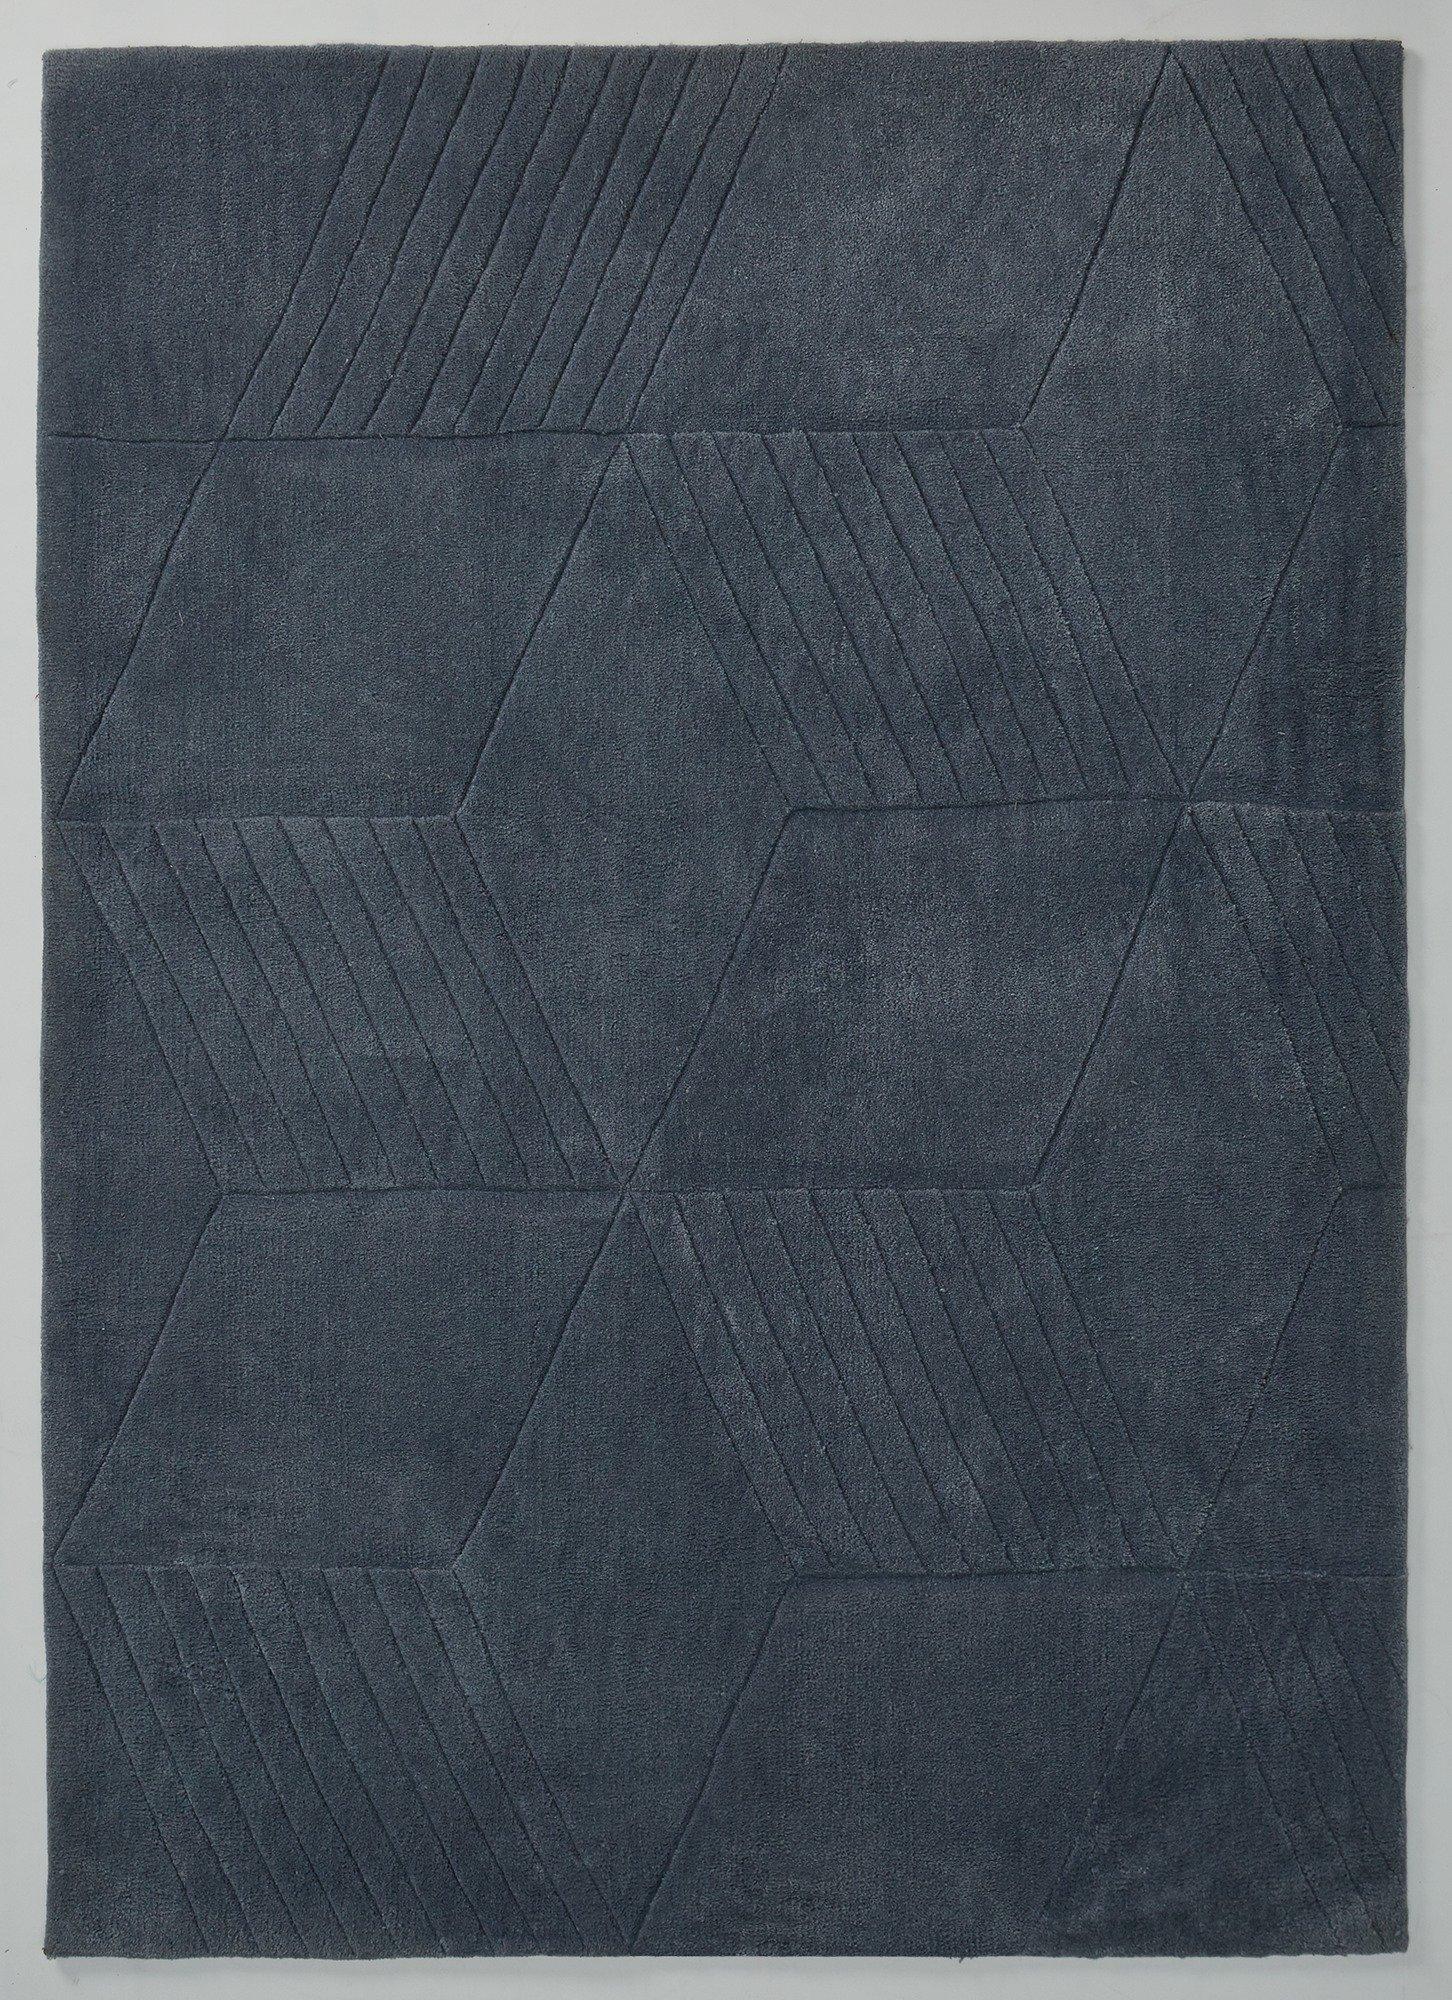 hygena lawson geometric rug 120x170cm steel blue. Black Bedroom Furniture Sets. Home Design Ideas